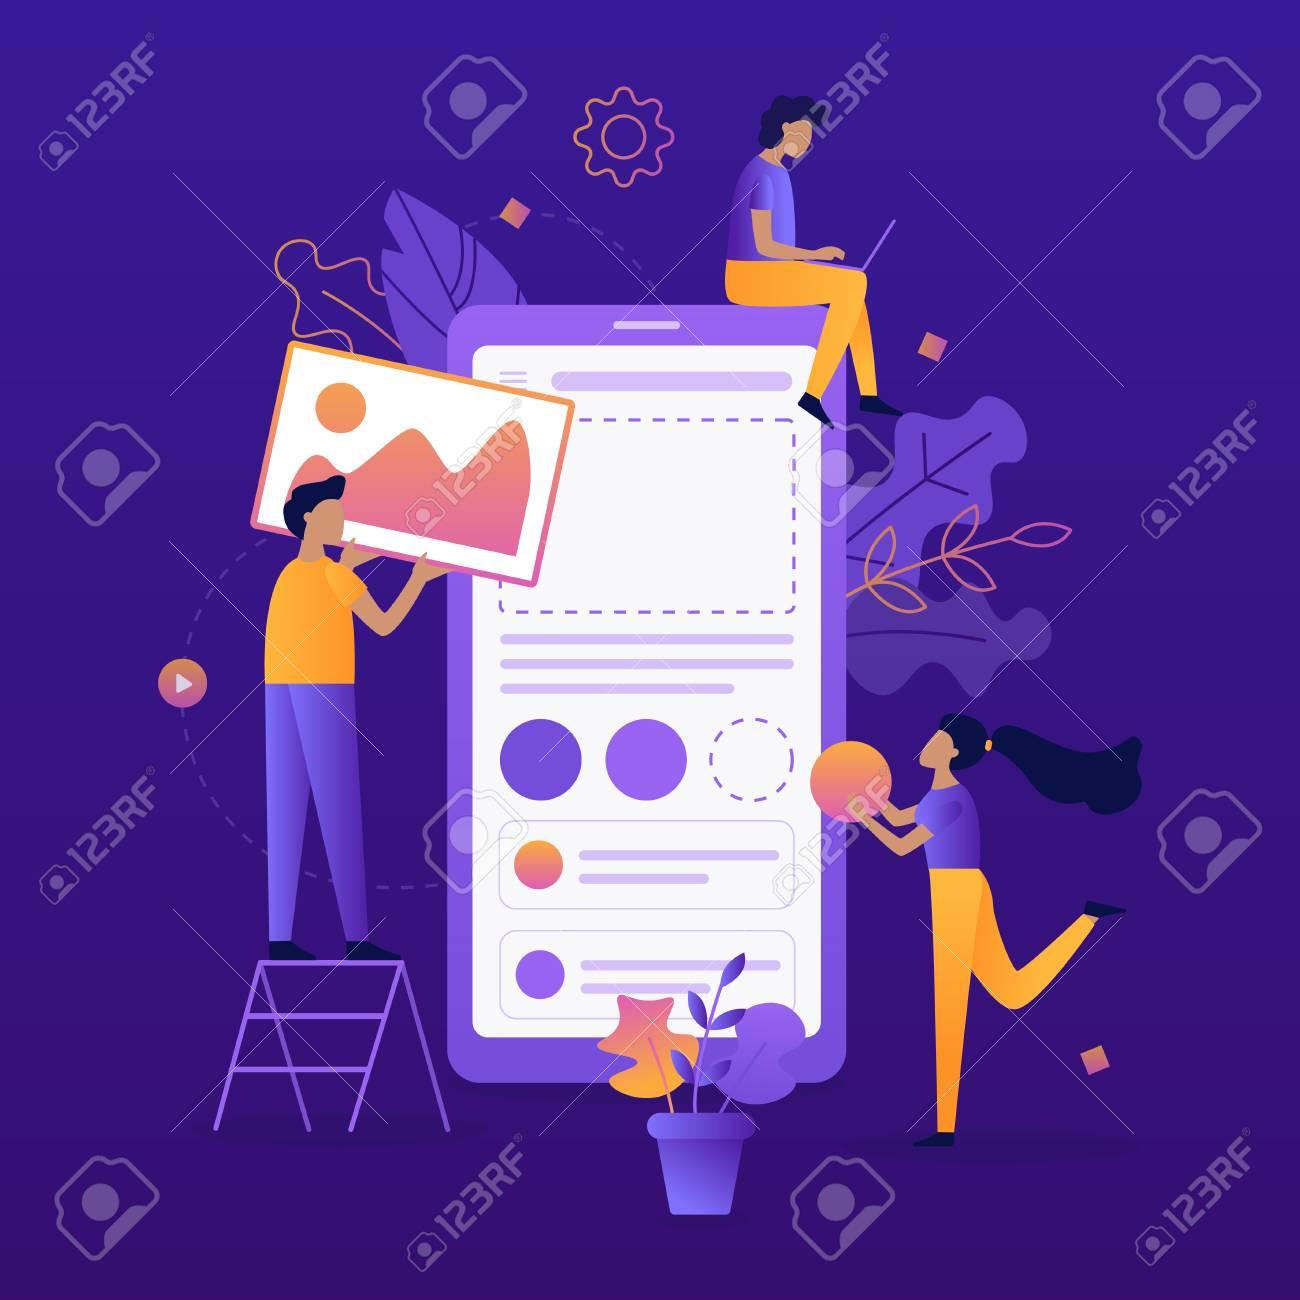 Team of developers construct mobile app. UI/UX design. Flat vector illustration. - 110349583